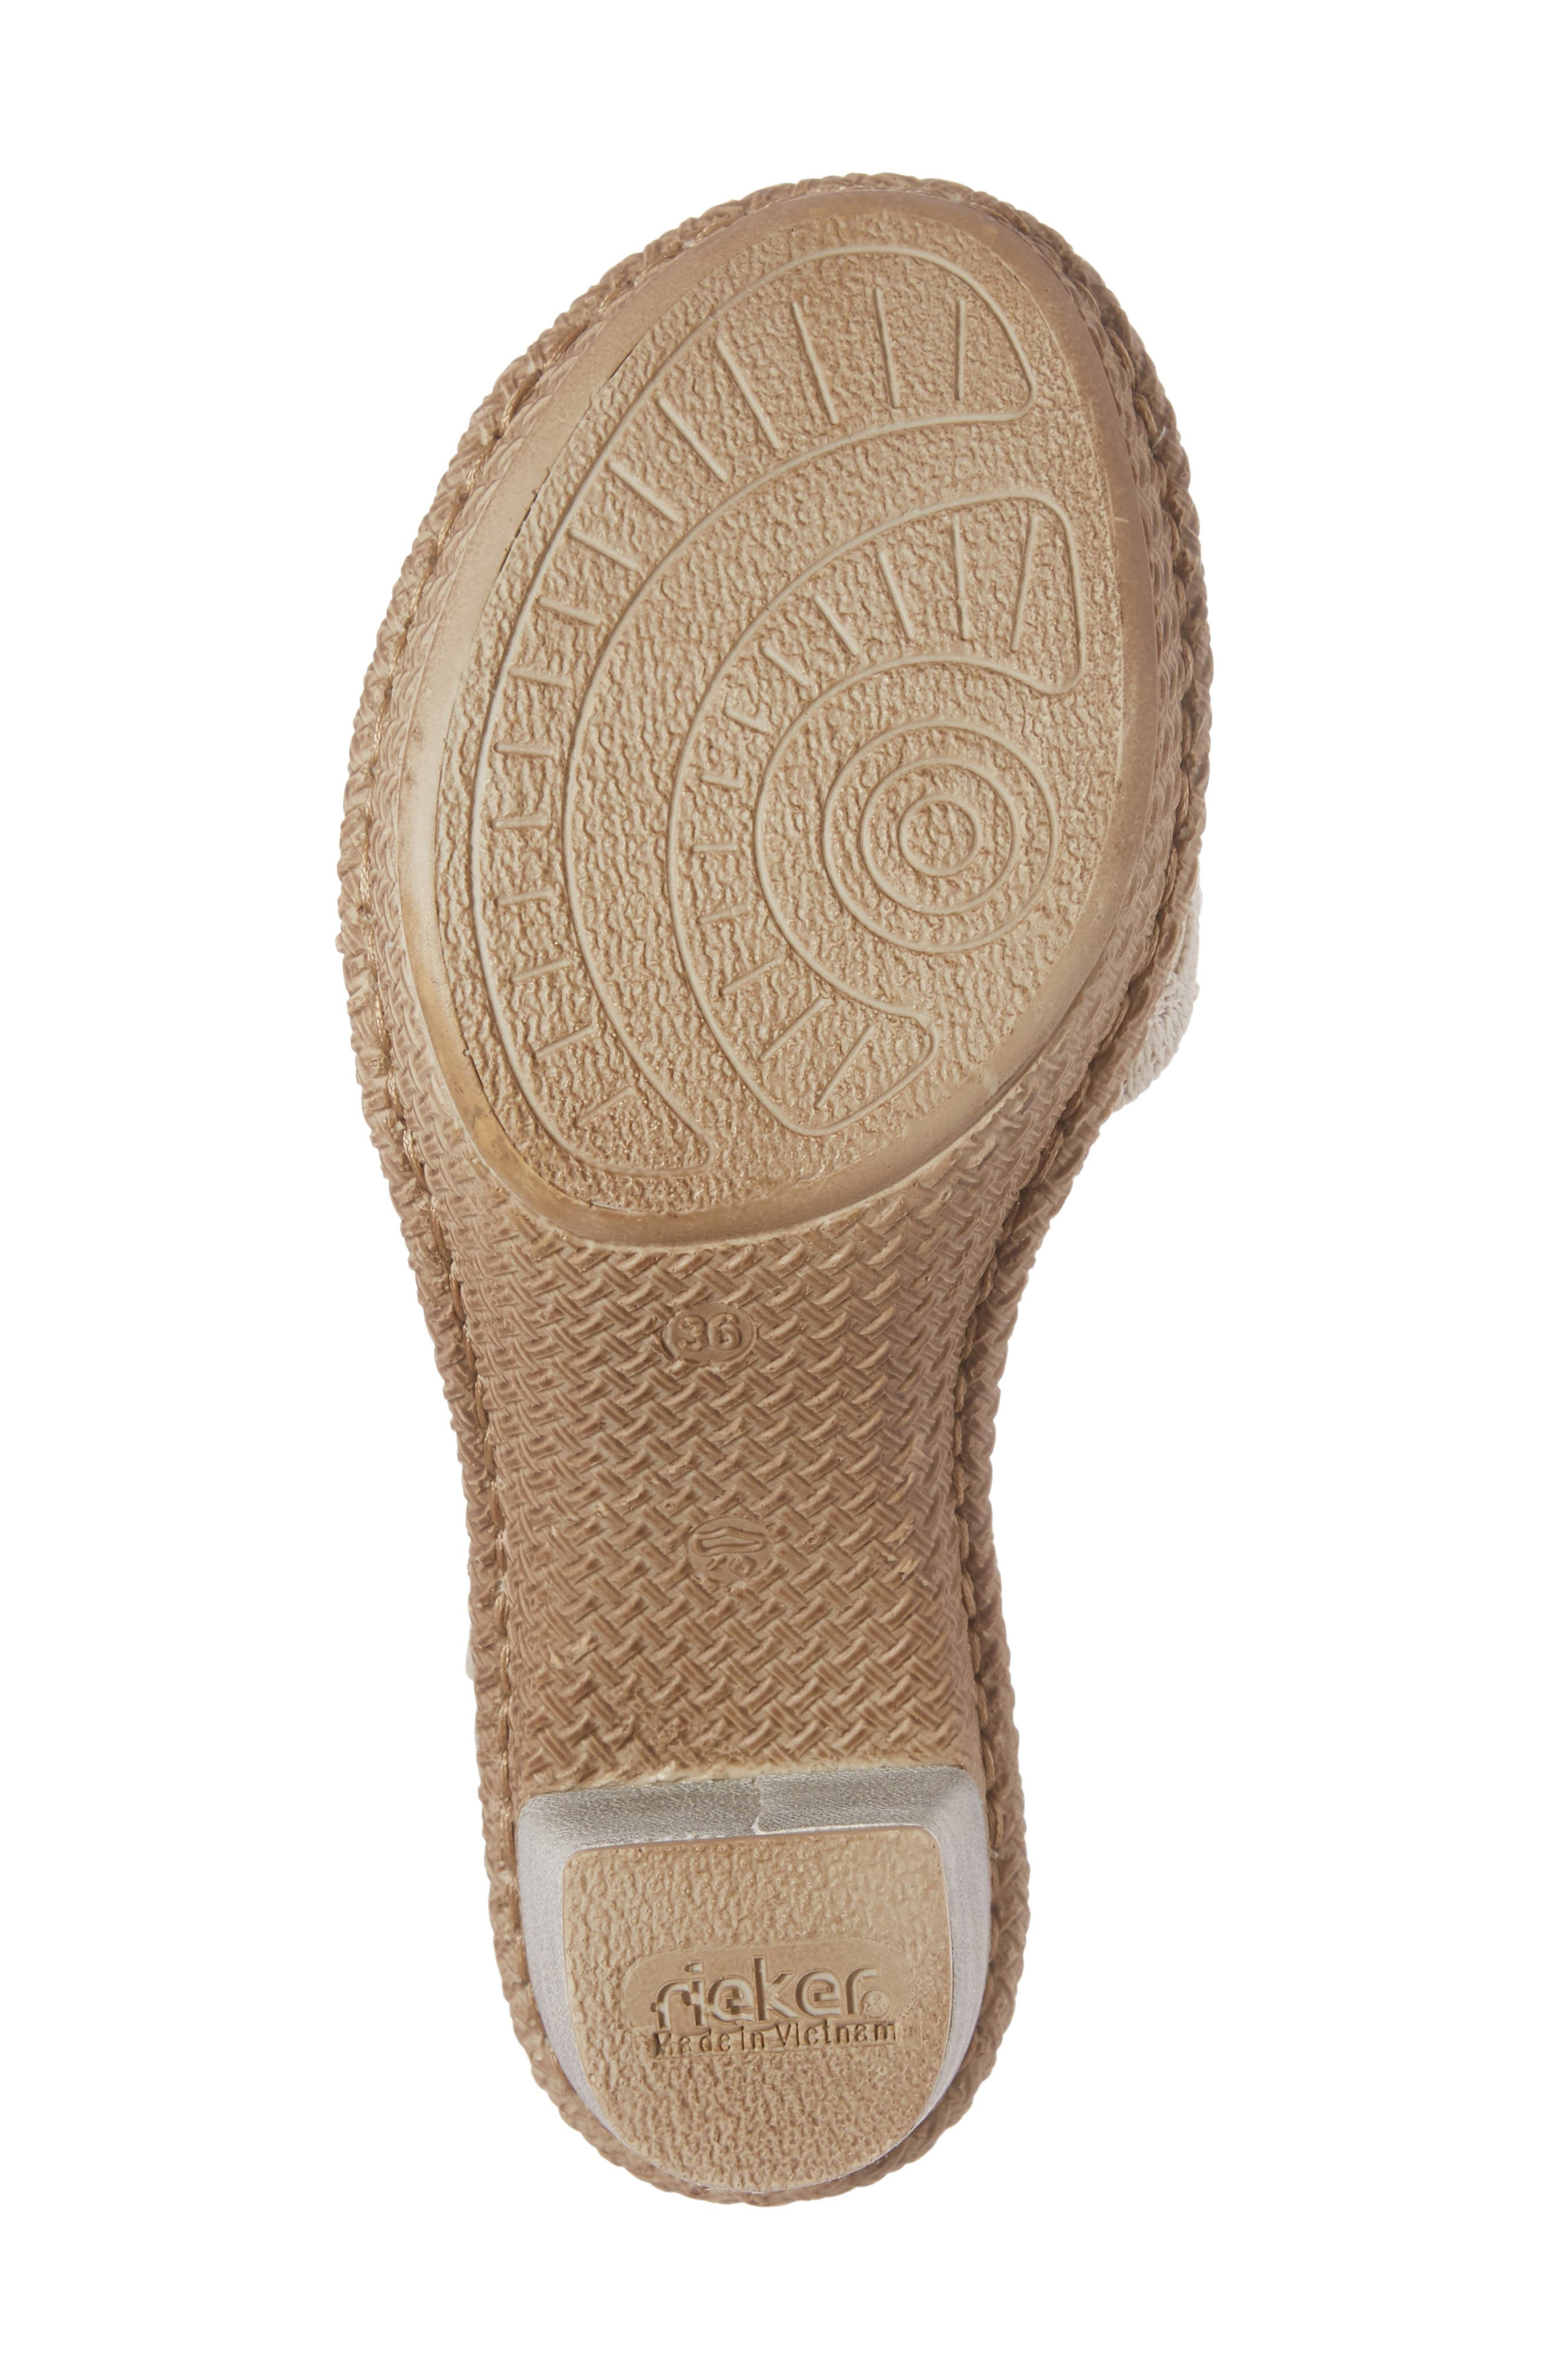 Rabea 61 Sandal,                             Alternate thumbnail 6, color,                             250